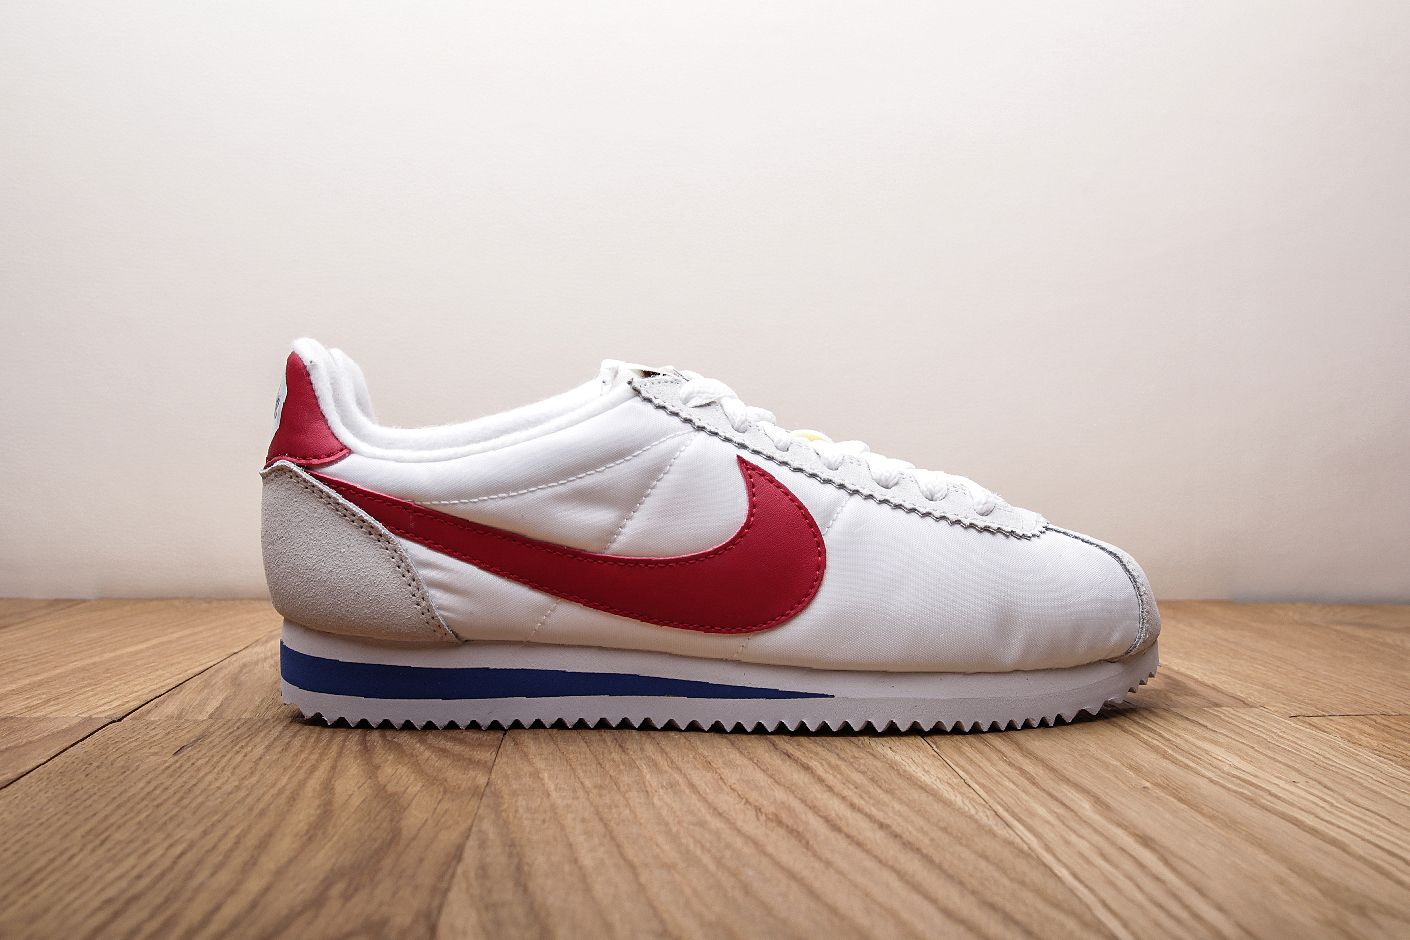 d4bba3de Купить белые мужские кроссовки Classic Cortez Nylon Prem QS от Nike ...